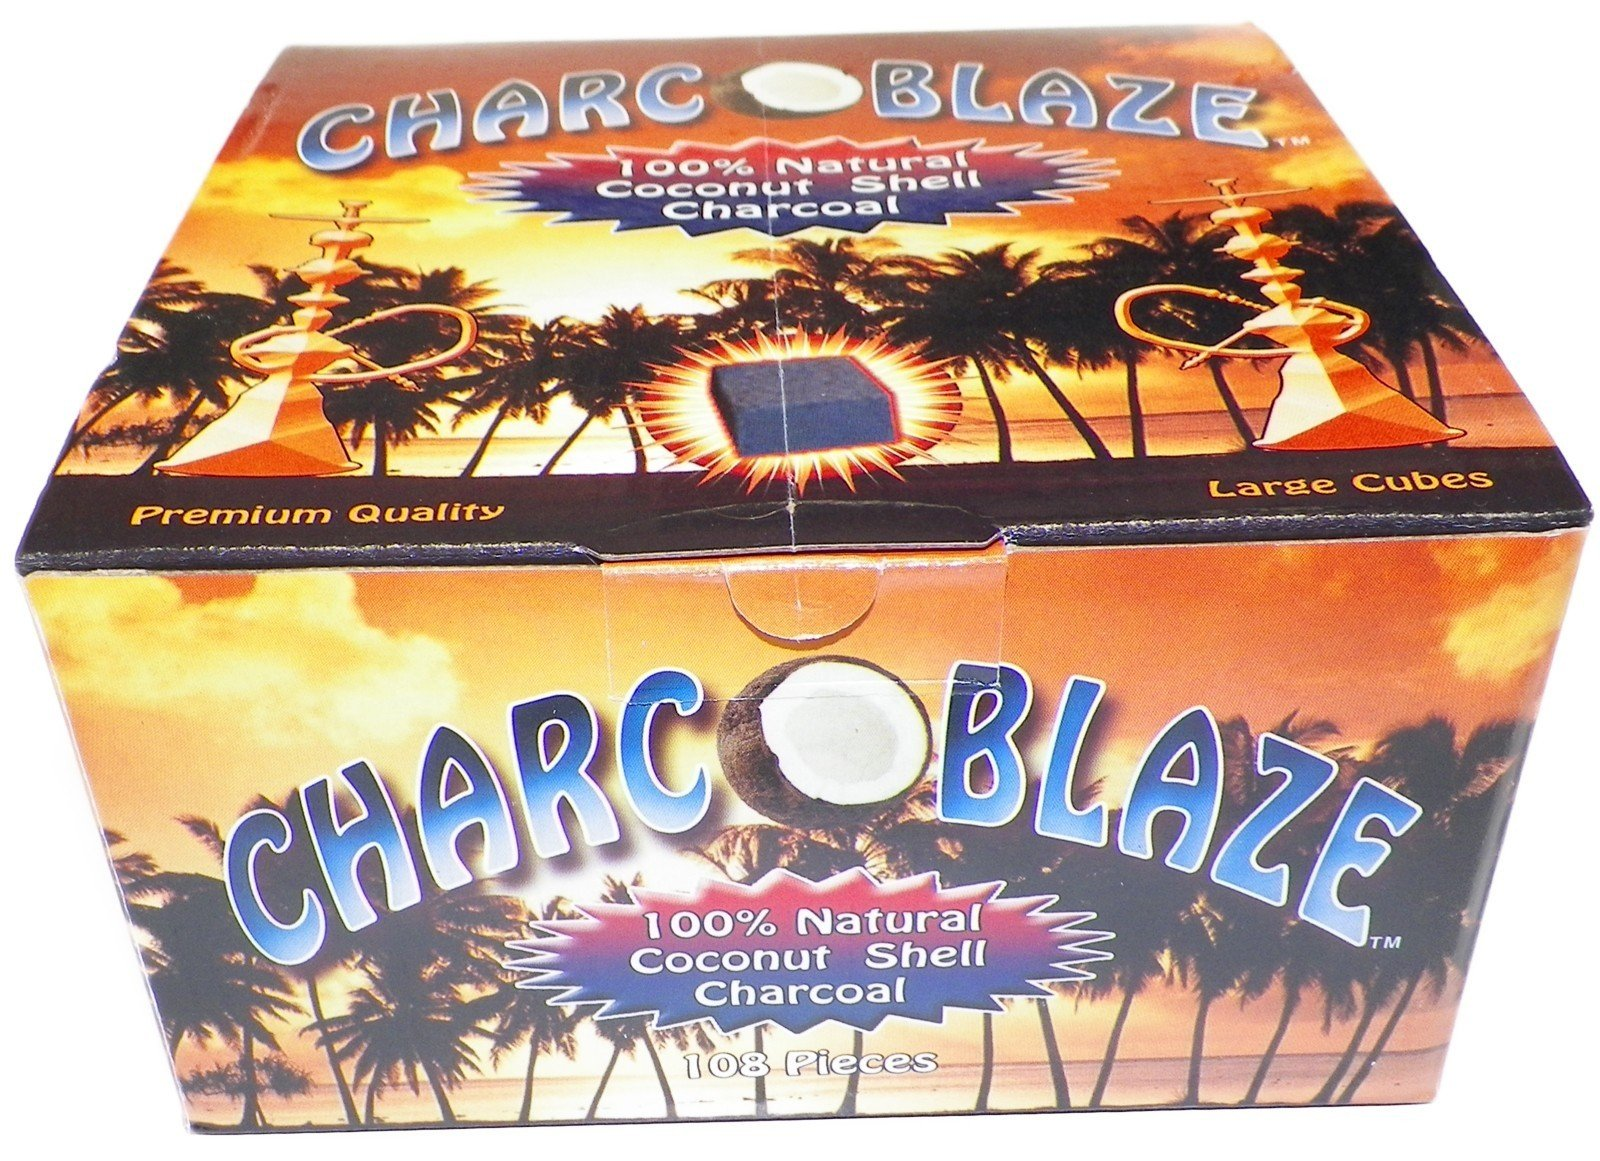 Charcoblaze Natural Coconut Hookah Charcoal 1.5KG